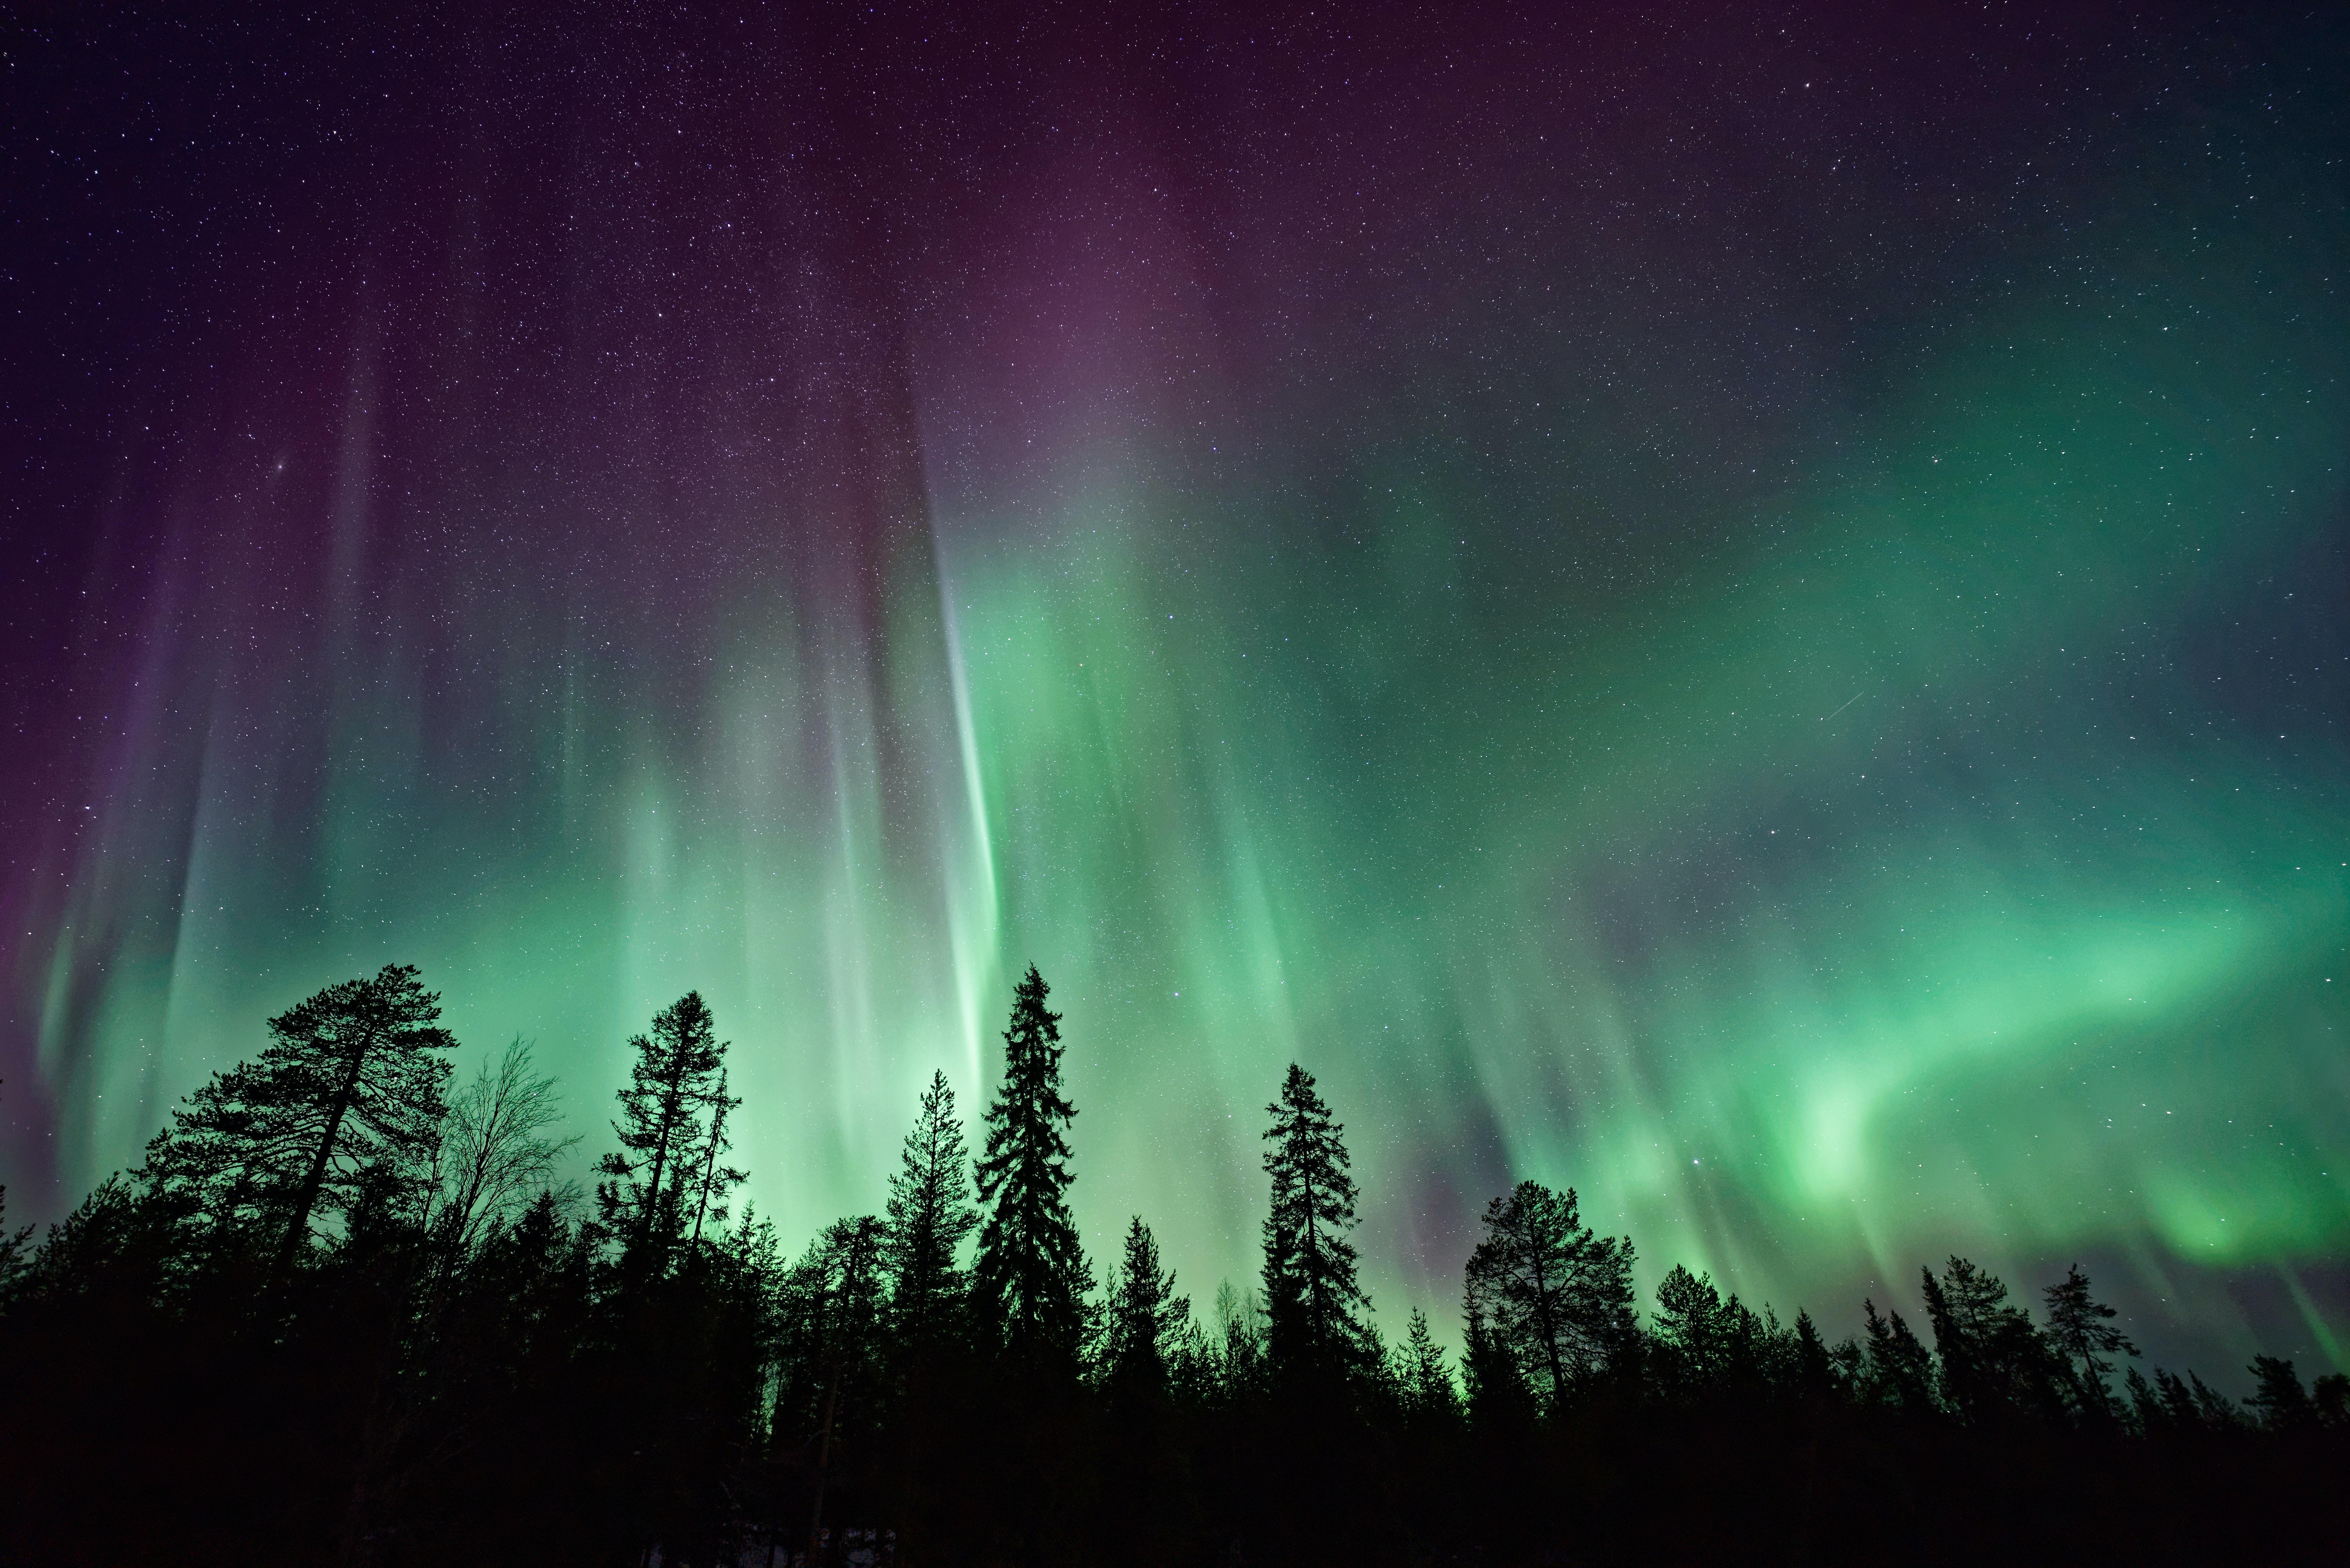 silhouette of trees near Aurora Borealis at night